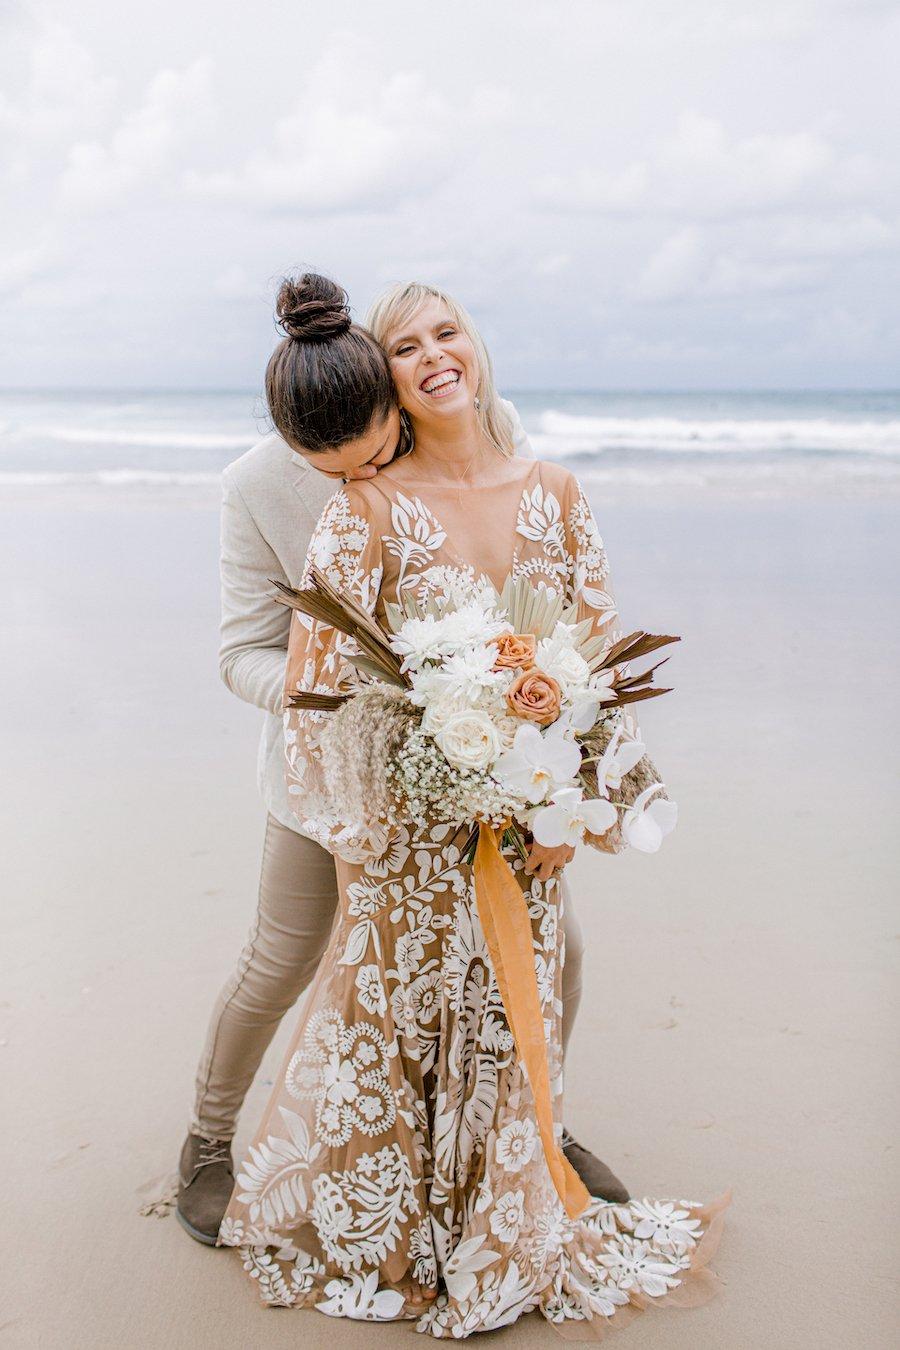 maddy + daniel kissing on the beach